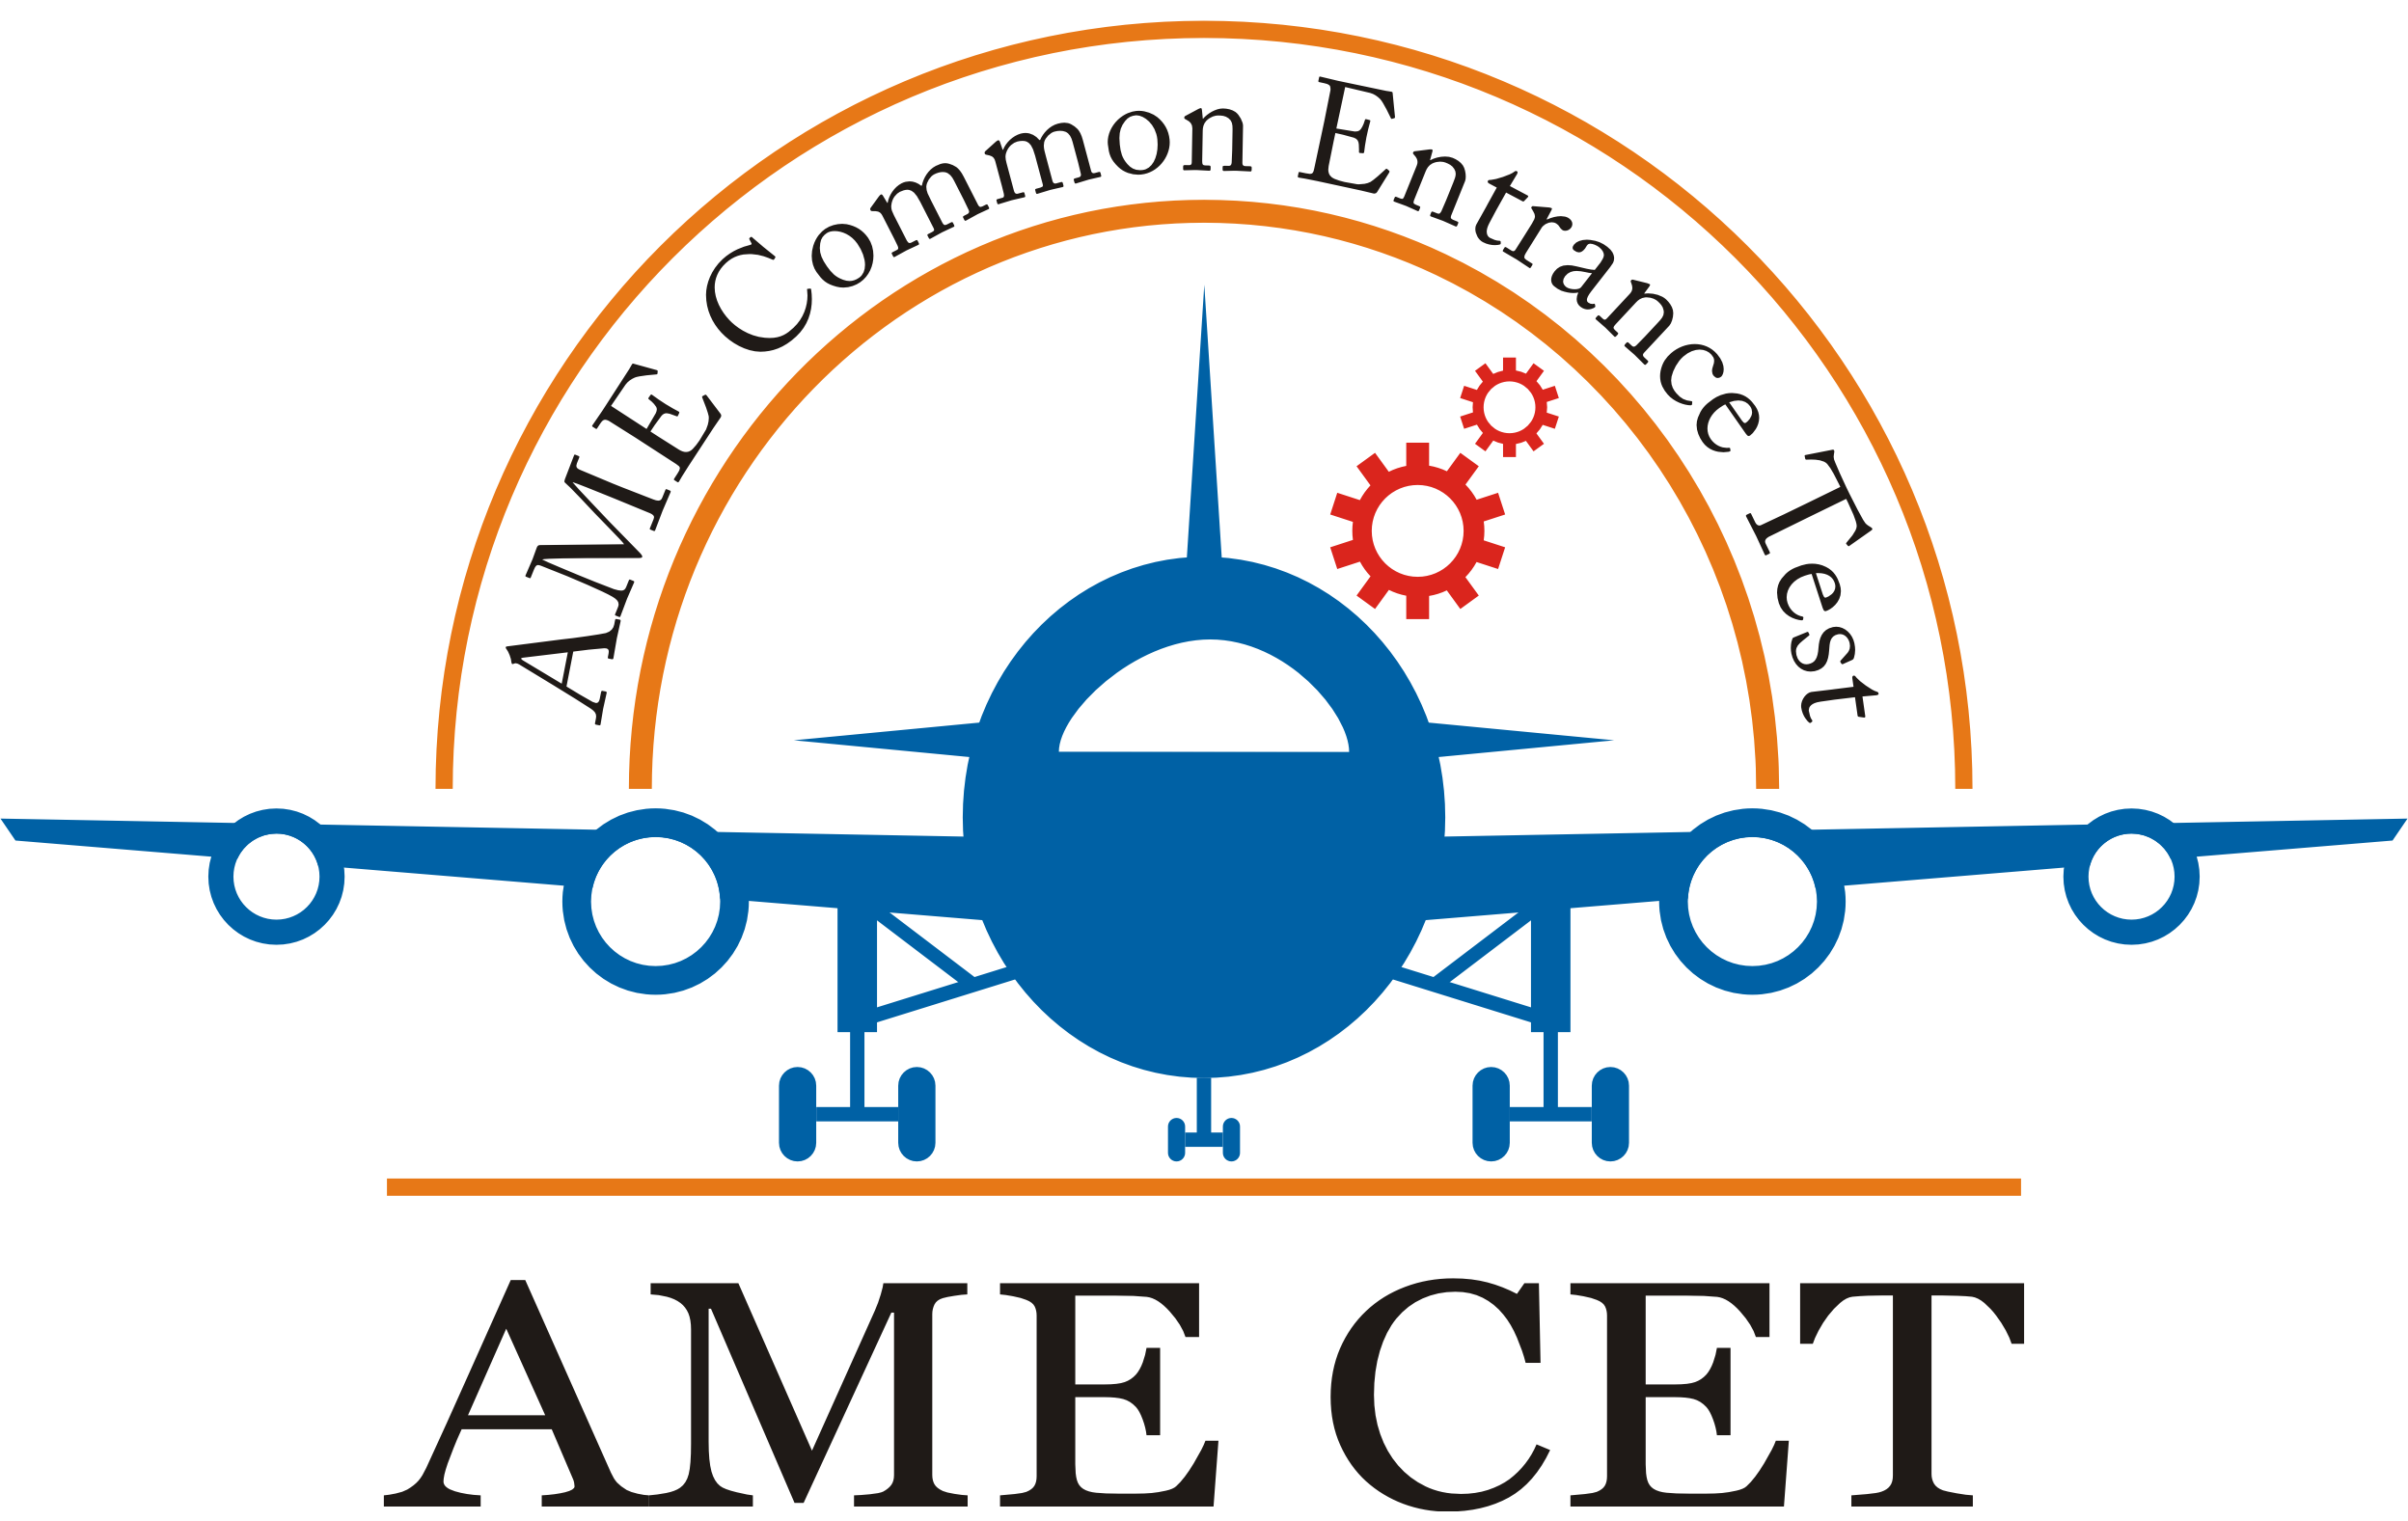 AME CET 2019 Blog